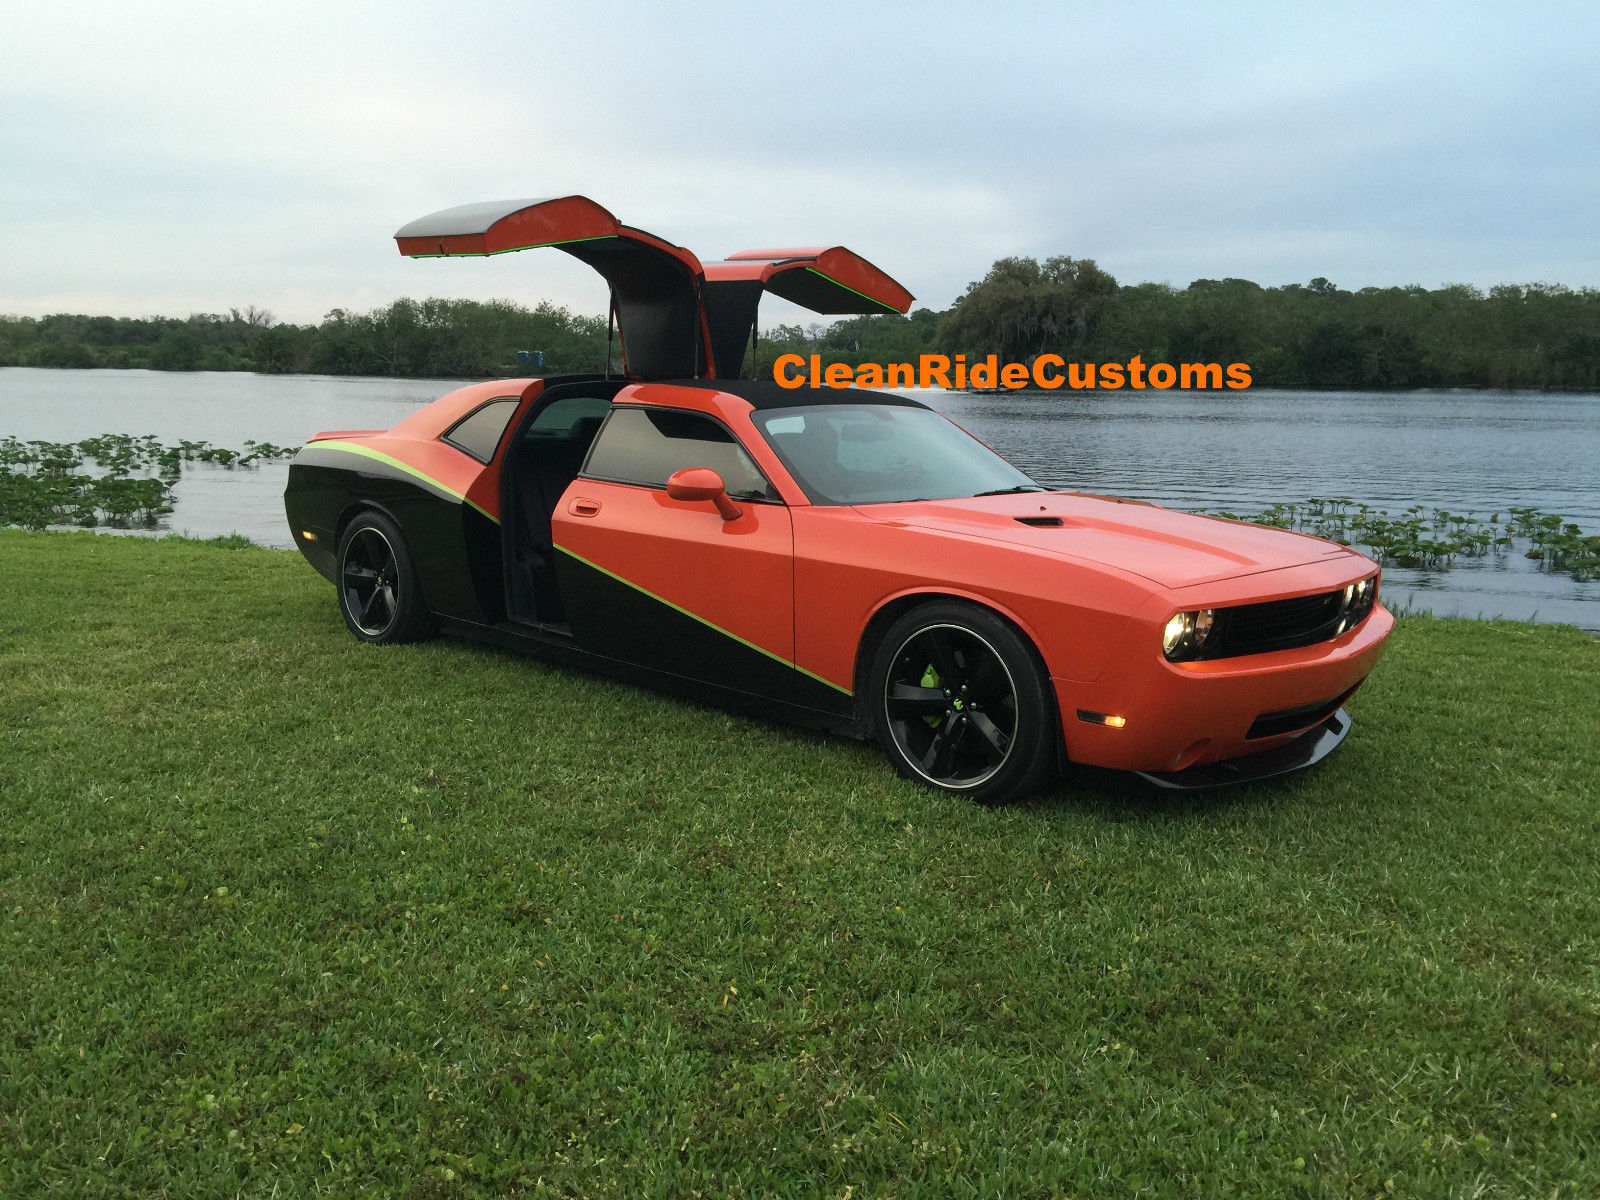 Four Door Dodge Challenger Srt8 Has Rear Gullwing Doors